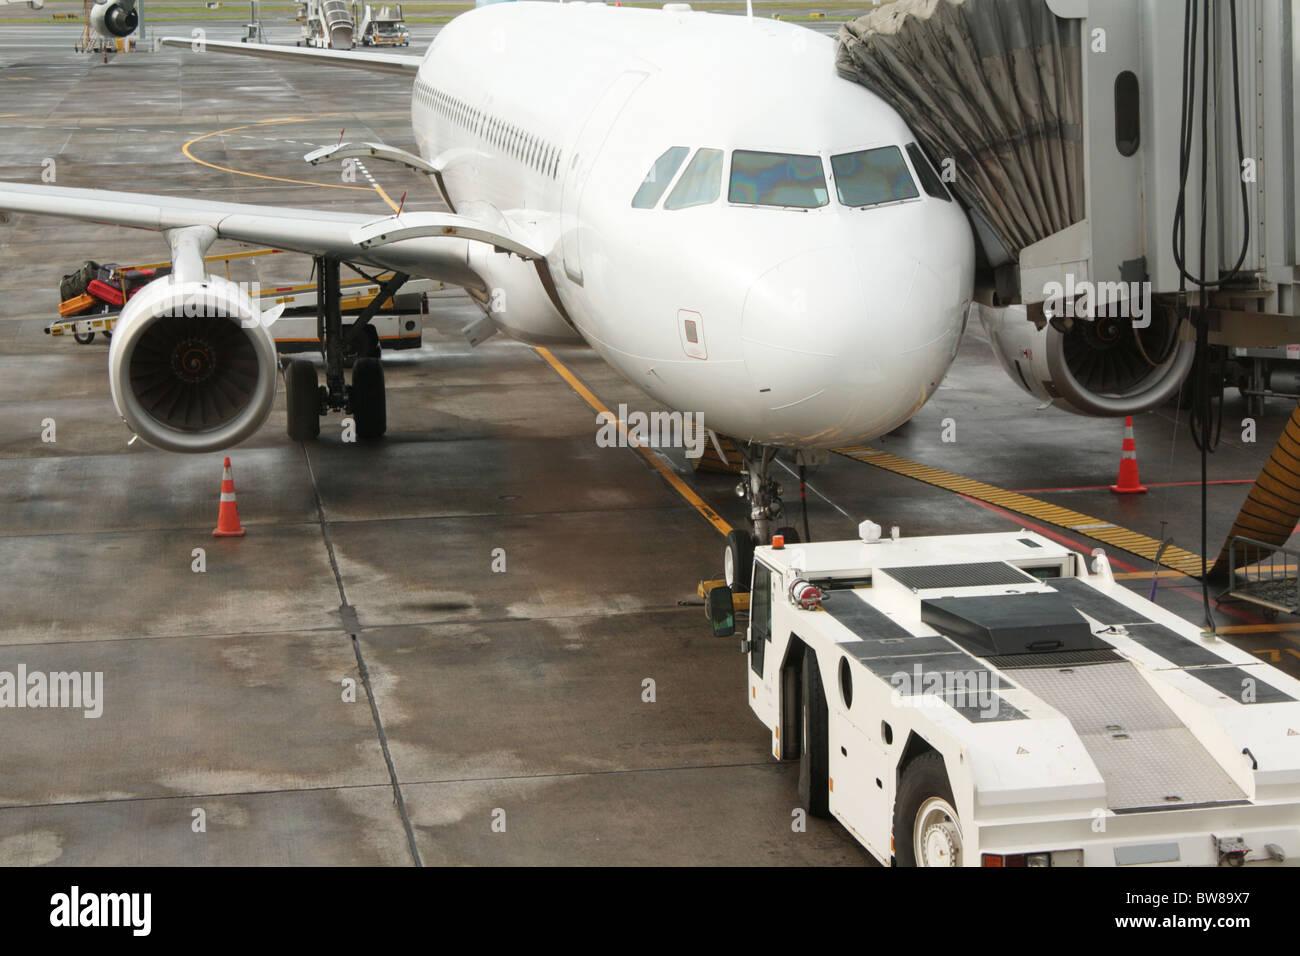 Airport Aeroplane & Airbridge - Stock Image